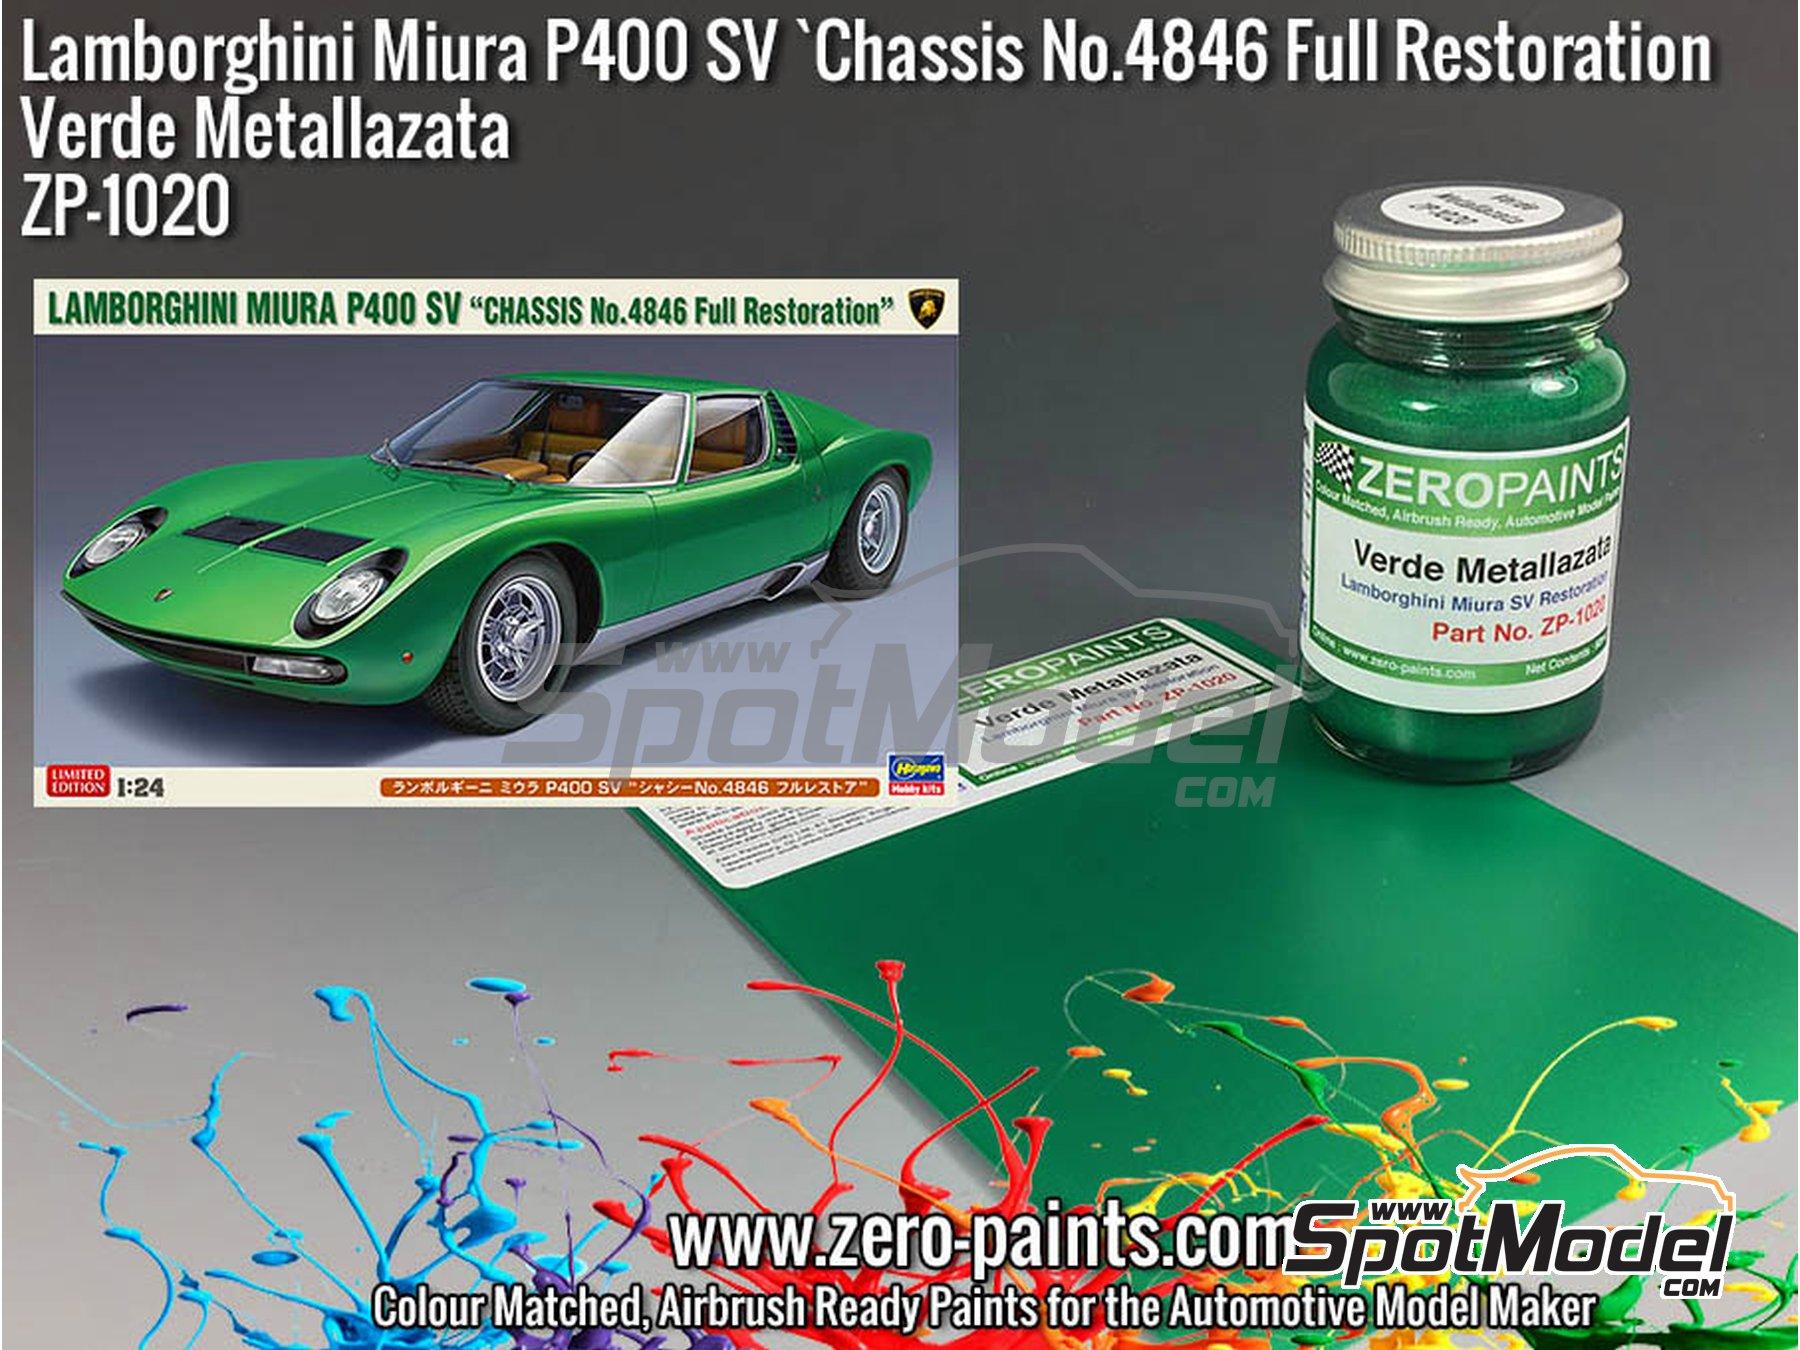 Image 1: Lamborghini Miura P400 SV Full Restoration Verde Metallazata Green - Code: 4846 - 1 x 60ml   Paint manufactured by Zero Paints (ref.ZP-1020-4846)